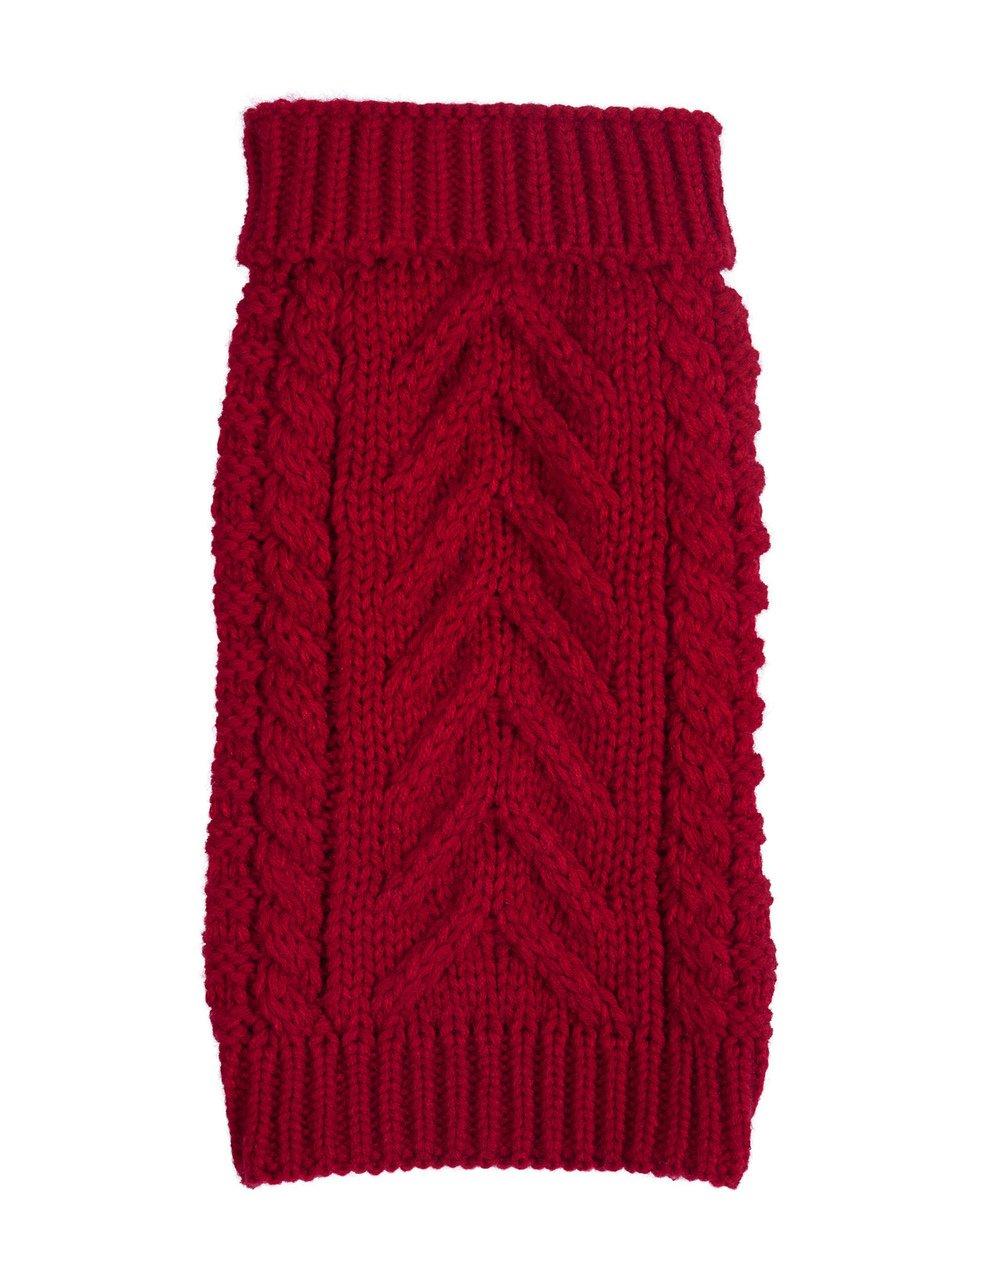 fabdog Super Chunky Knit Turtleneck Dog Sweater Red (14'')